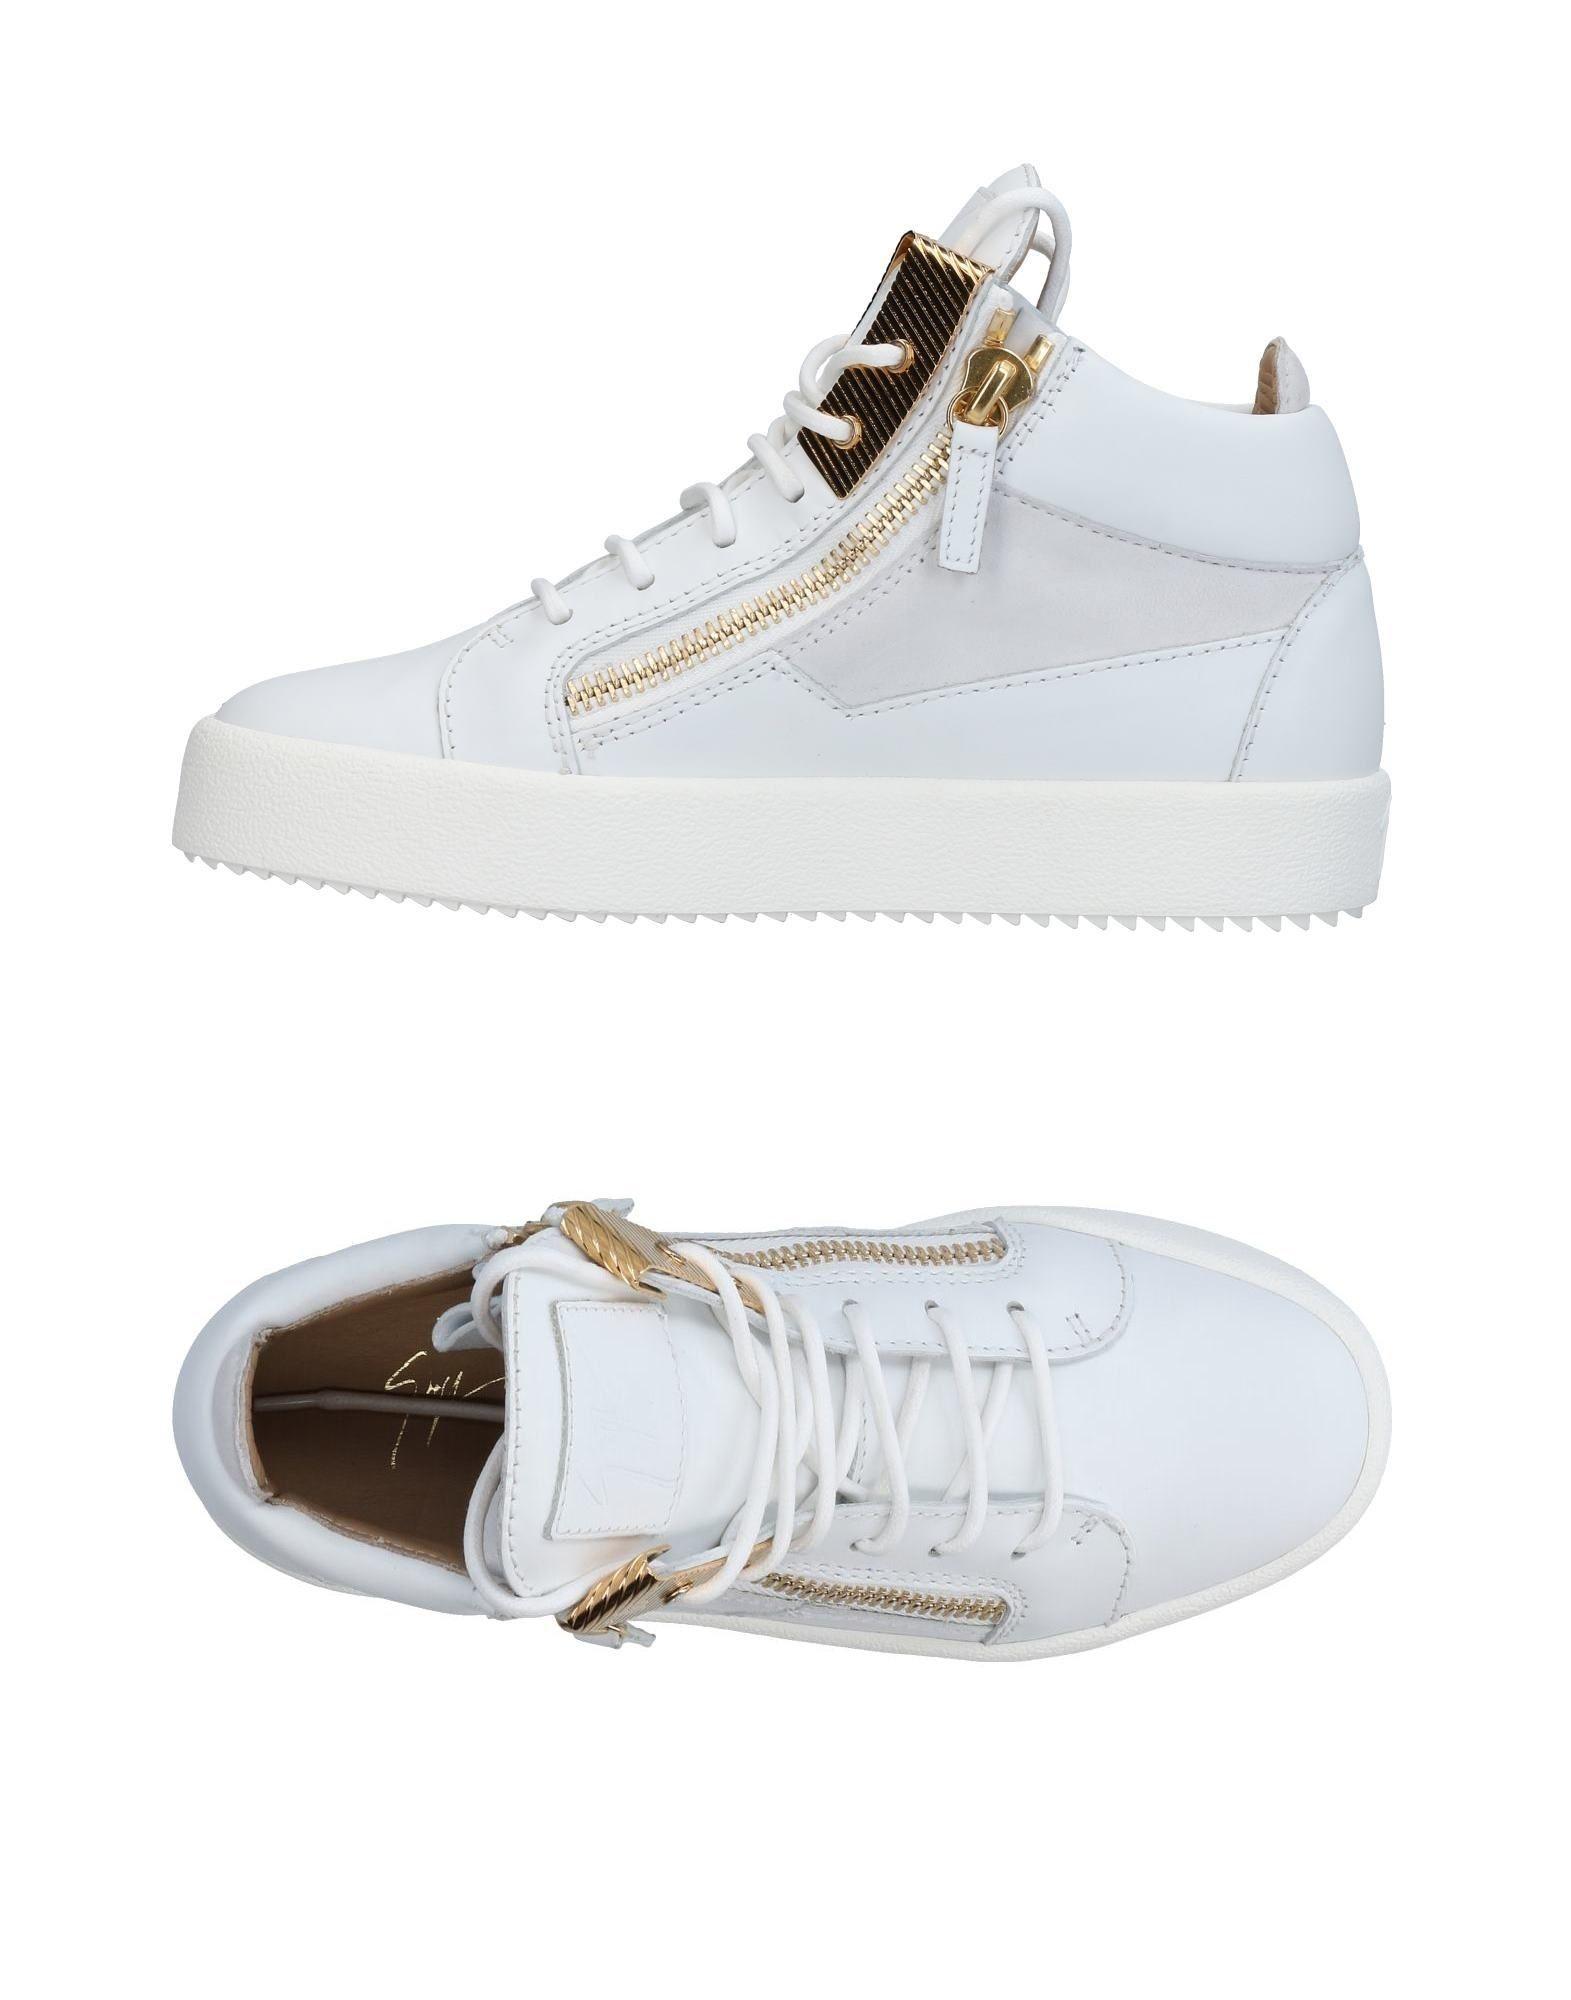 Giuseppe Damen Zanotti Sneakers Damen Giuseppe  11463293WI Neue Schuhe 1cee2b